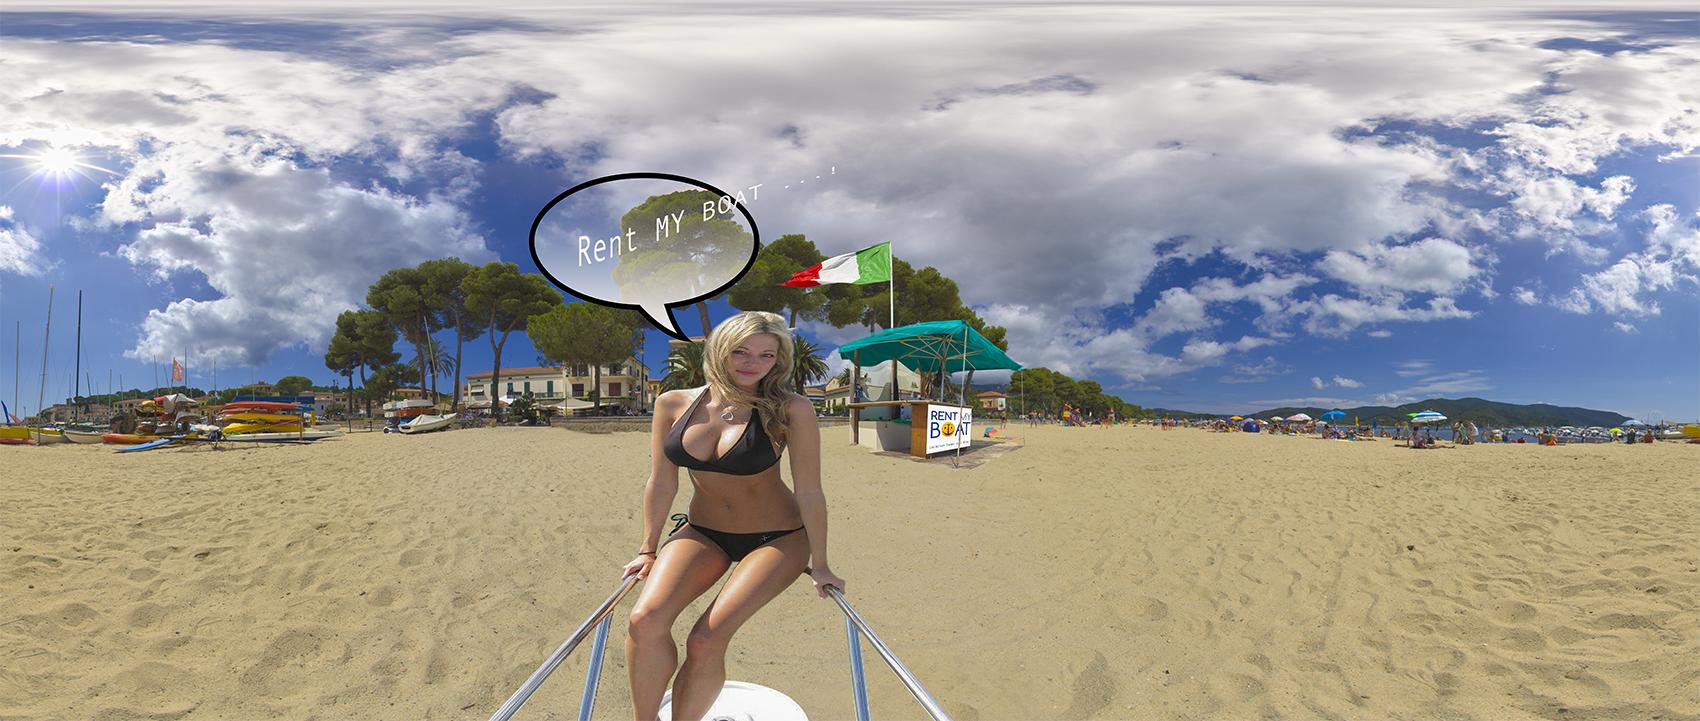 Rent MY Boat - Da Maurizio